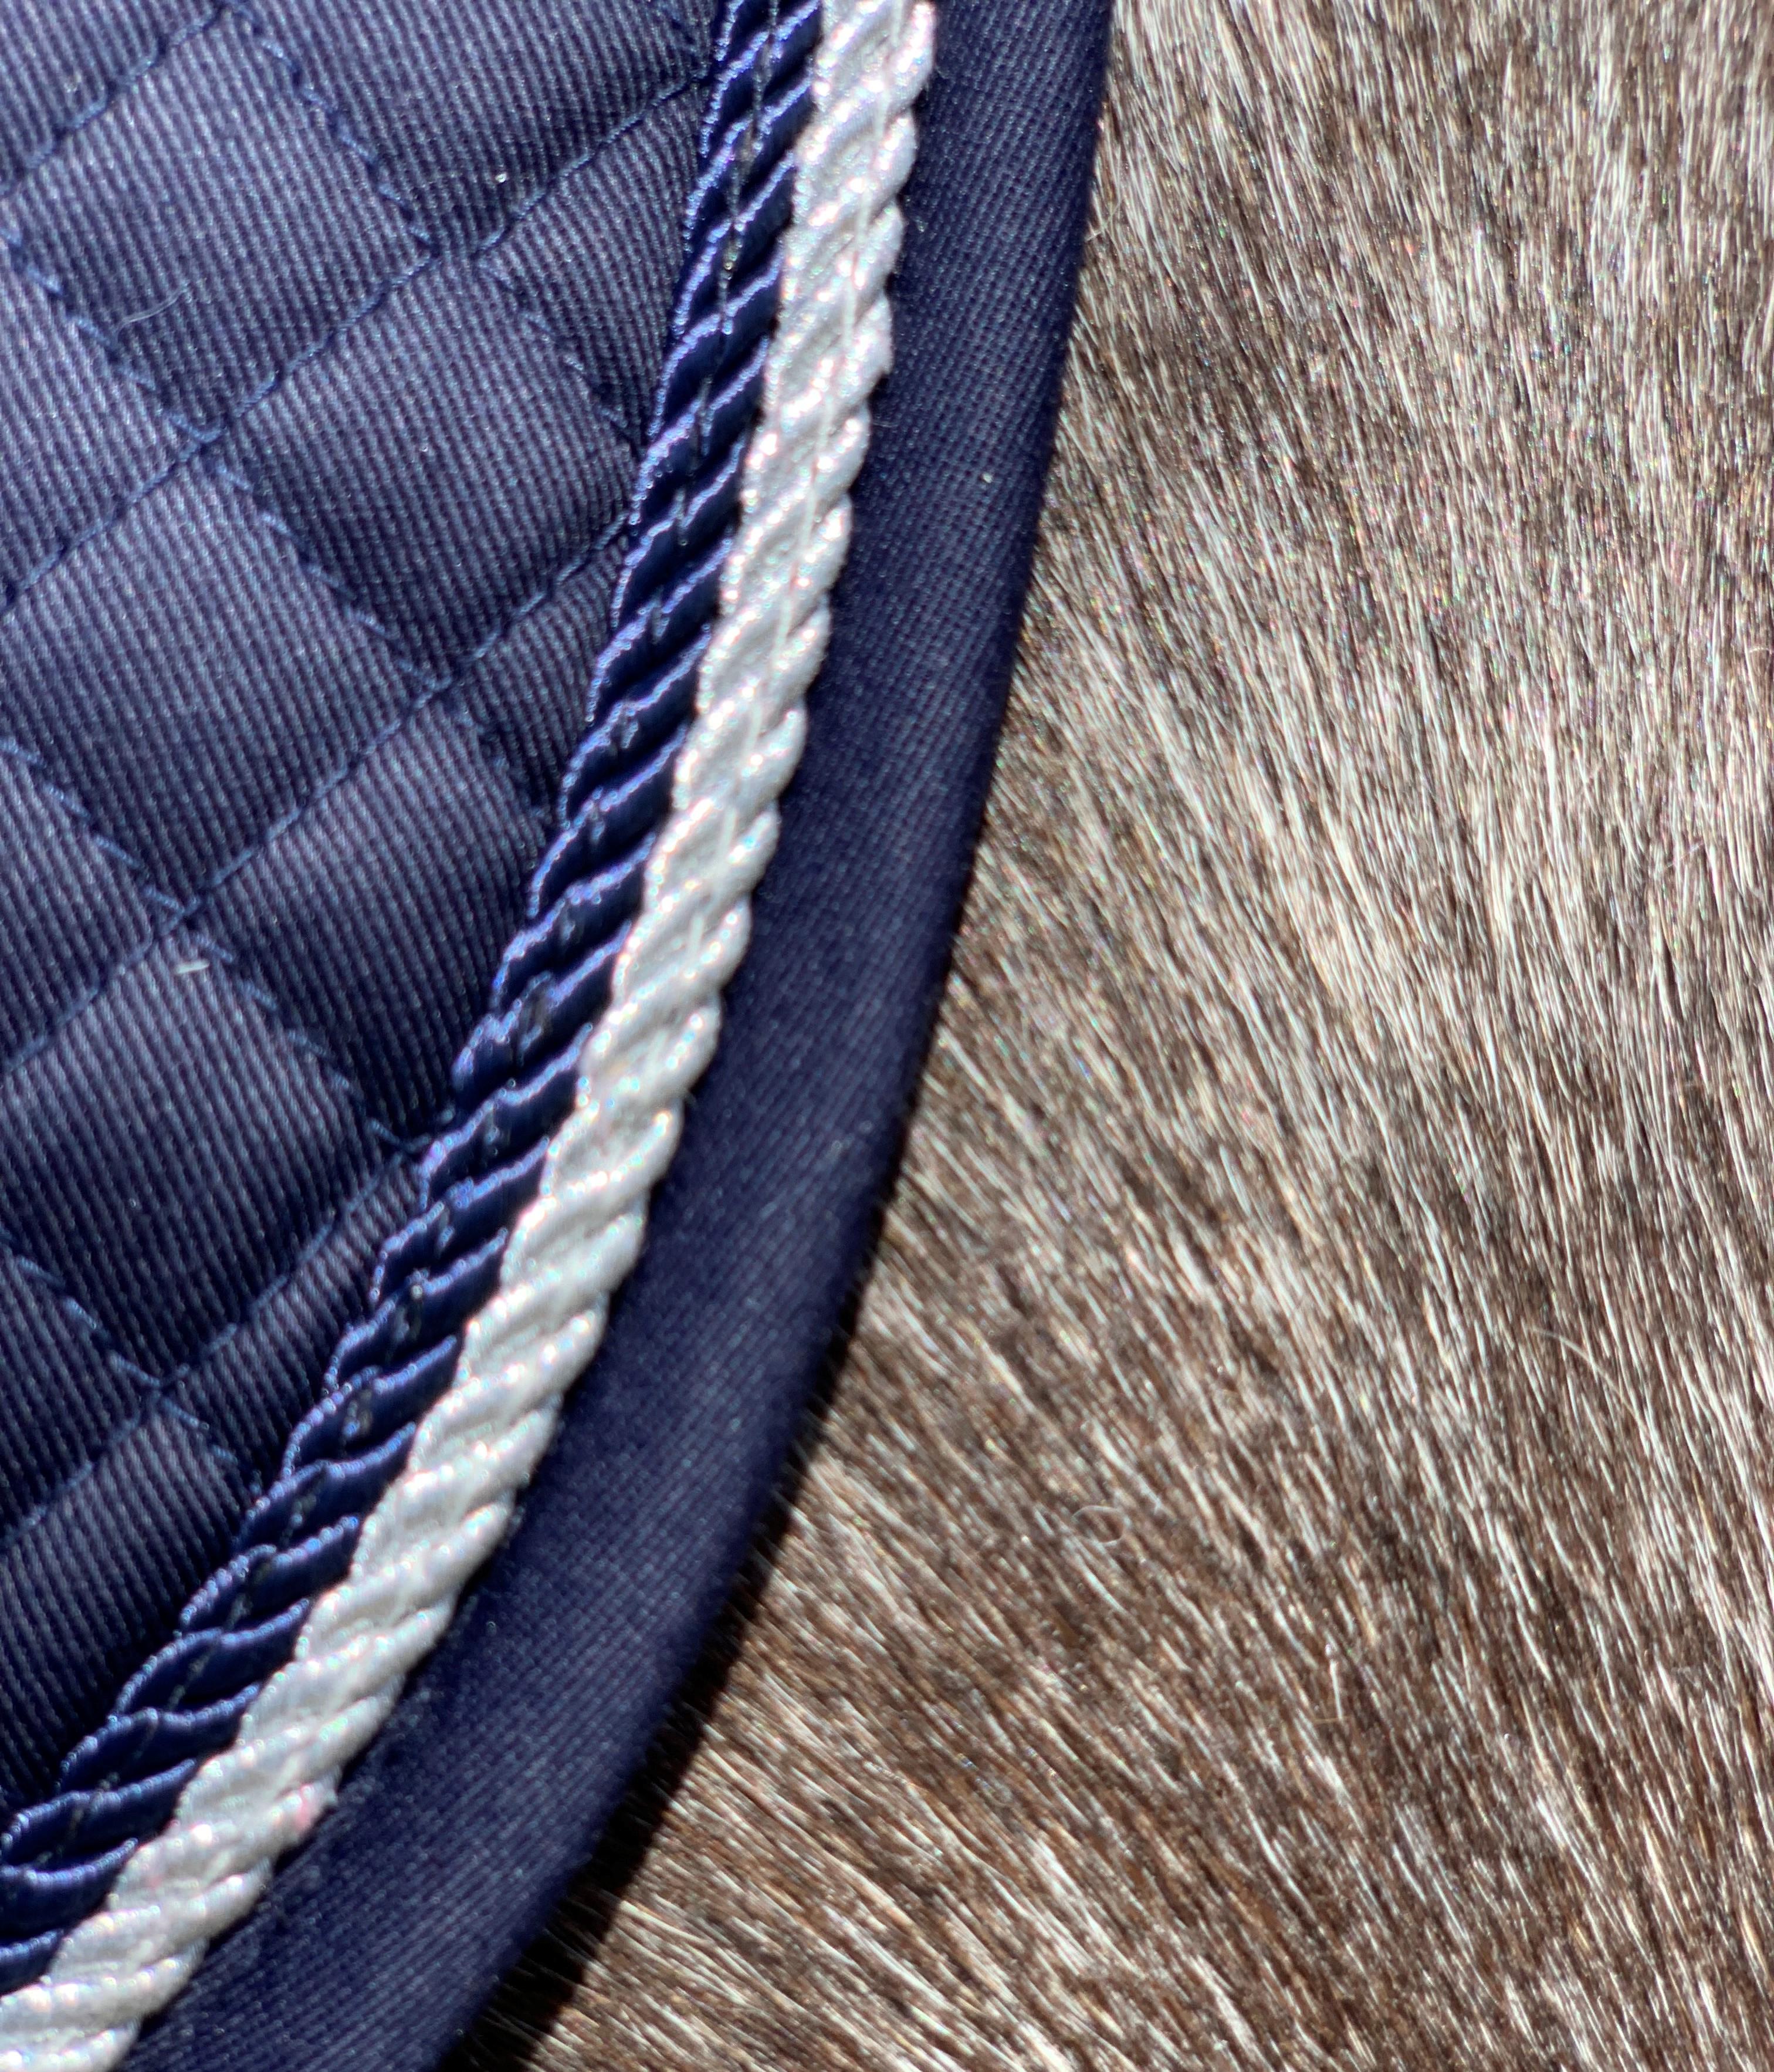 Valleyhorsewear Dressage Saddle Pad-Navy-Navy/Silver rope binding